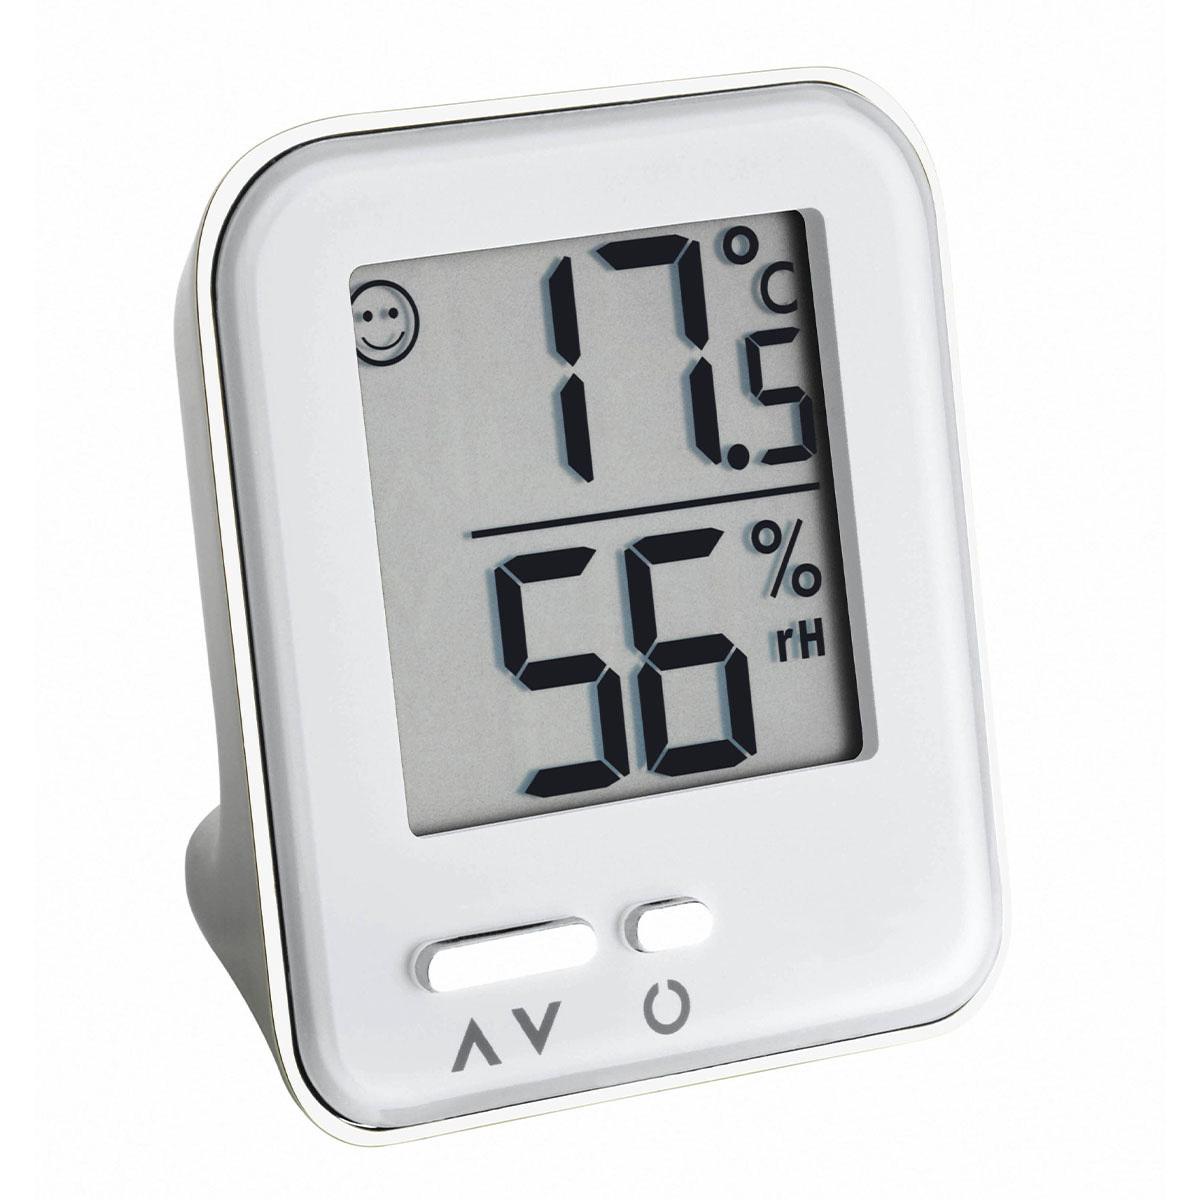 30-5029-digitales-thermo-hygrometer-metal-moxx-1200x1200px.jpg